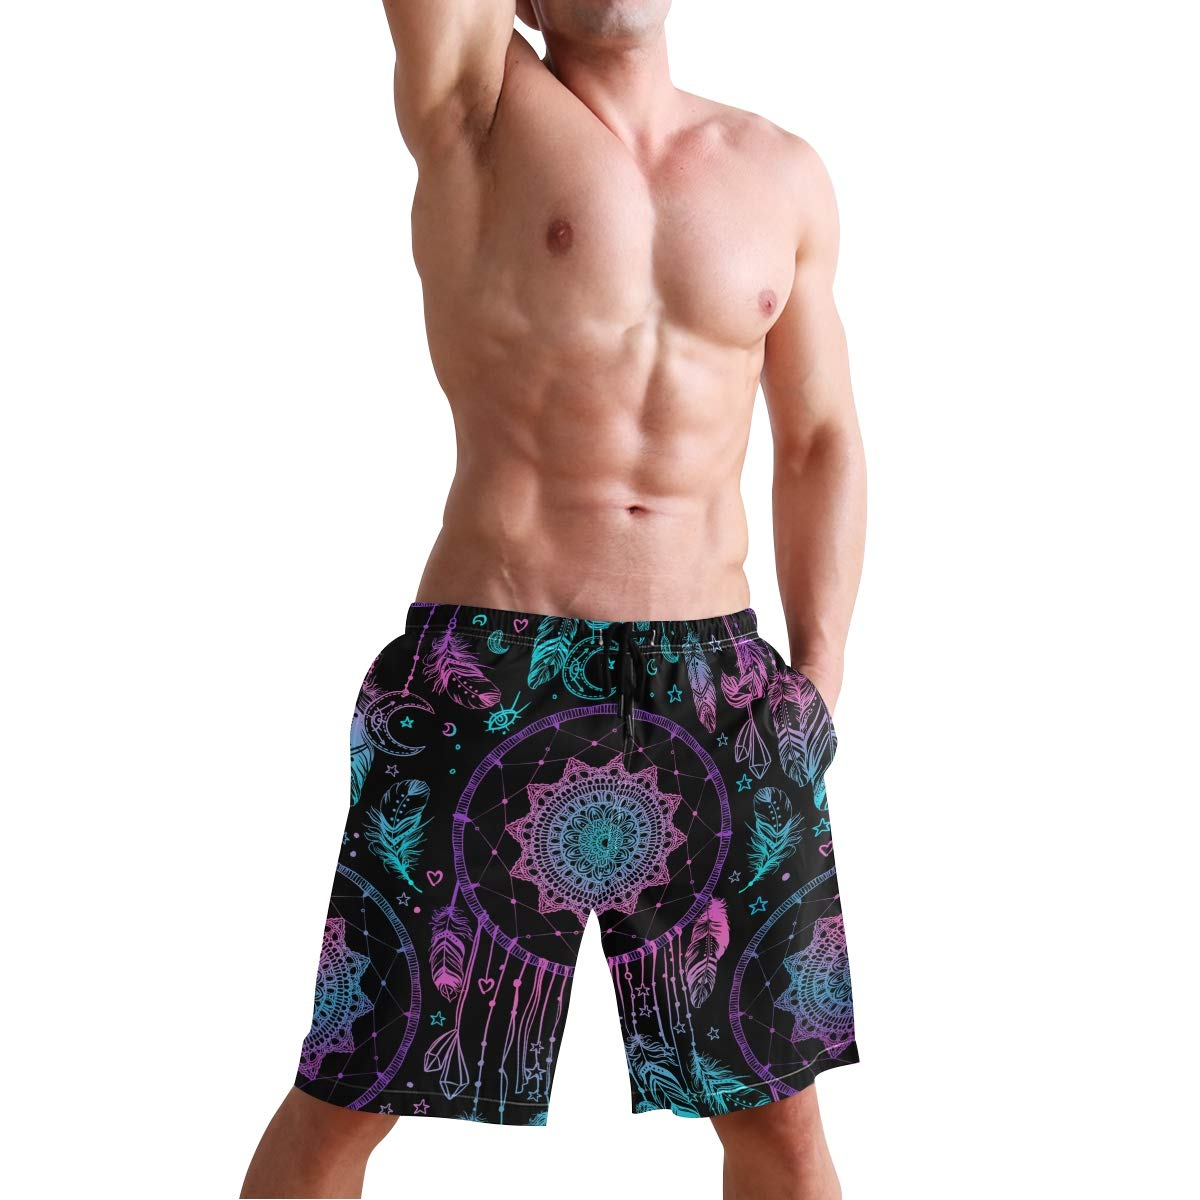 CENHOME Mens Swim Trunks Indian Dream Feathers Purple Blue Beach Board Shorts